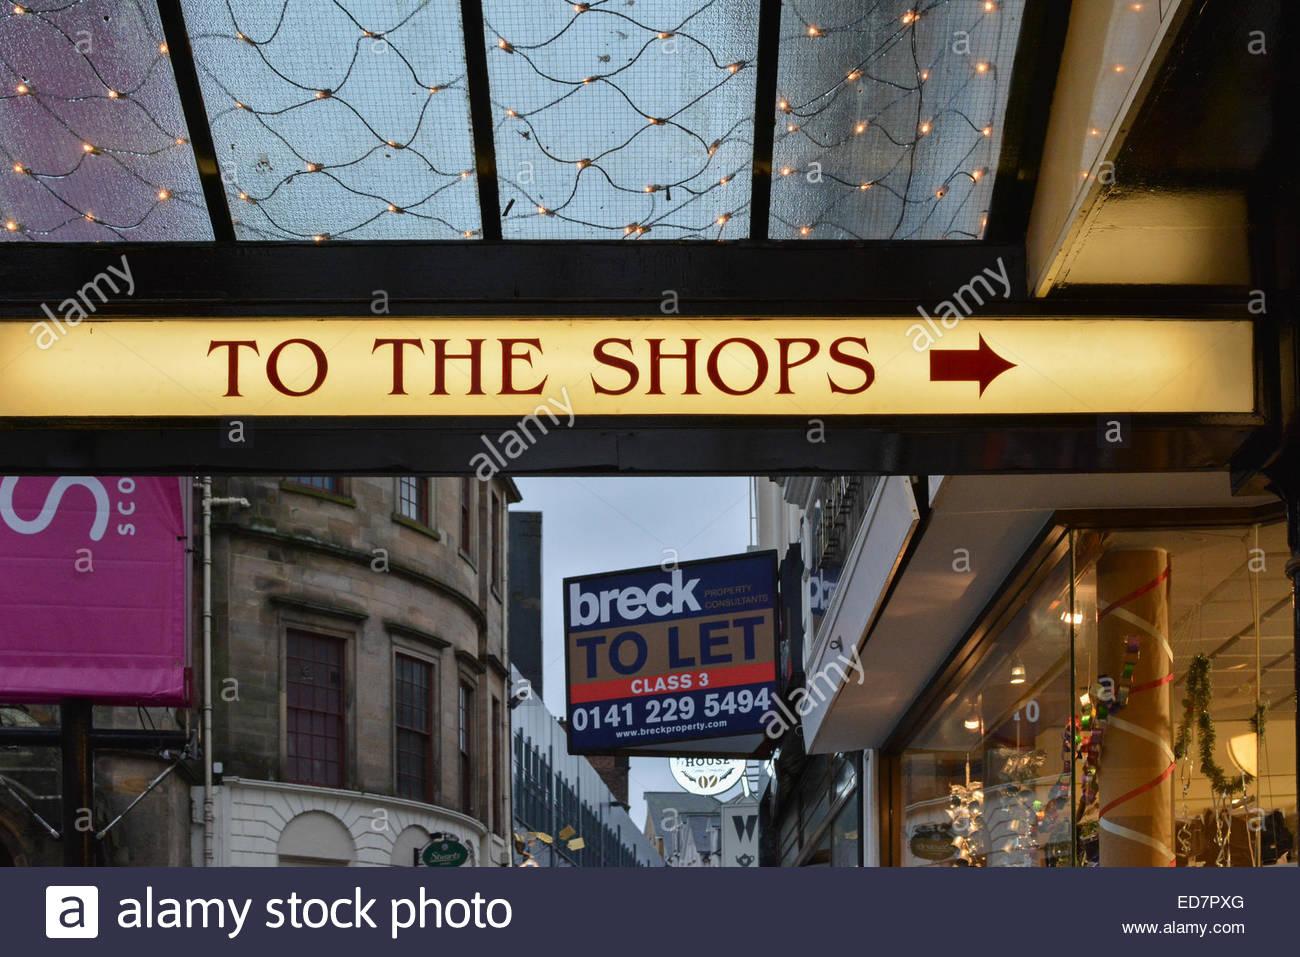 'Traditionnels DANS LES MAGASINS' et flèche dirigée vers l'Arcade, rue King Stirling, Stirling, Photo Stock